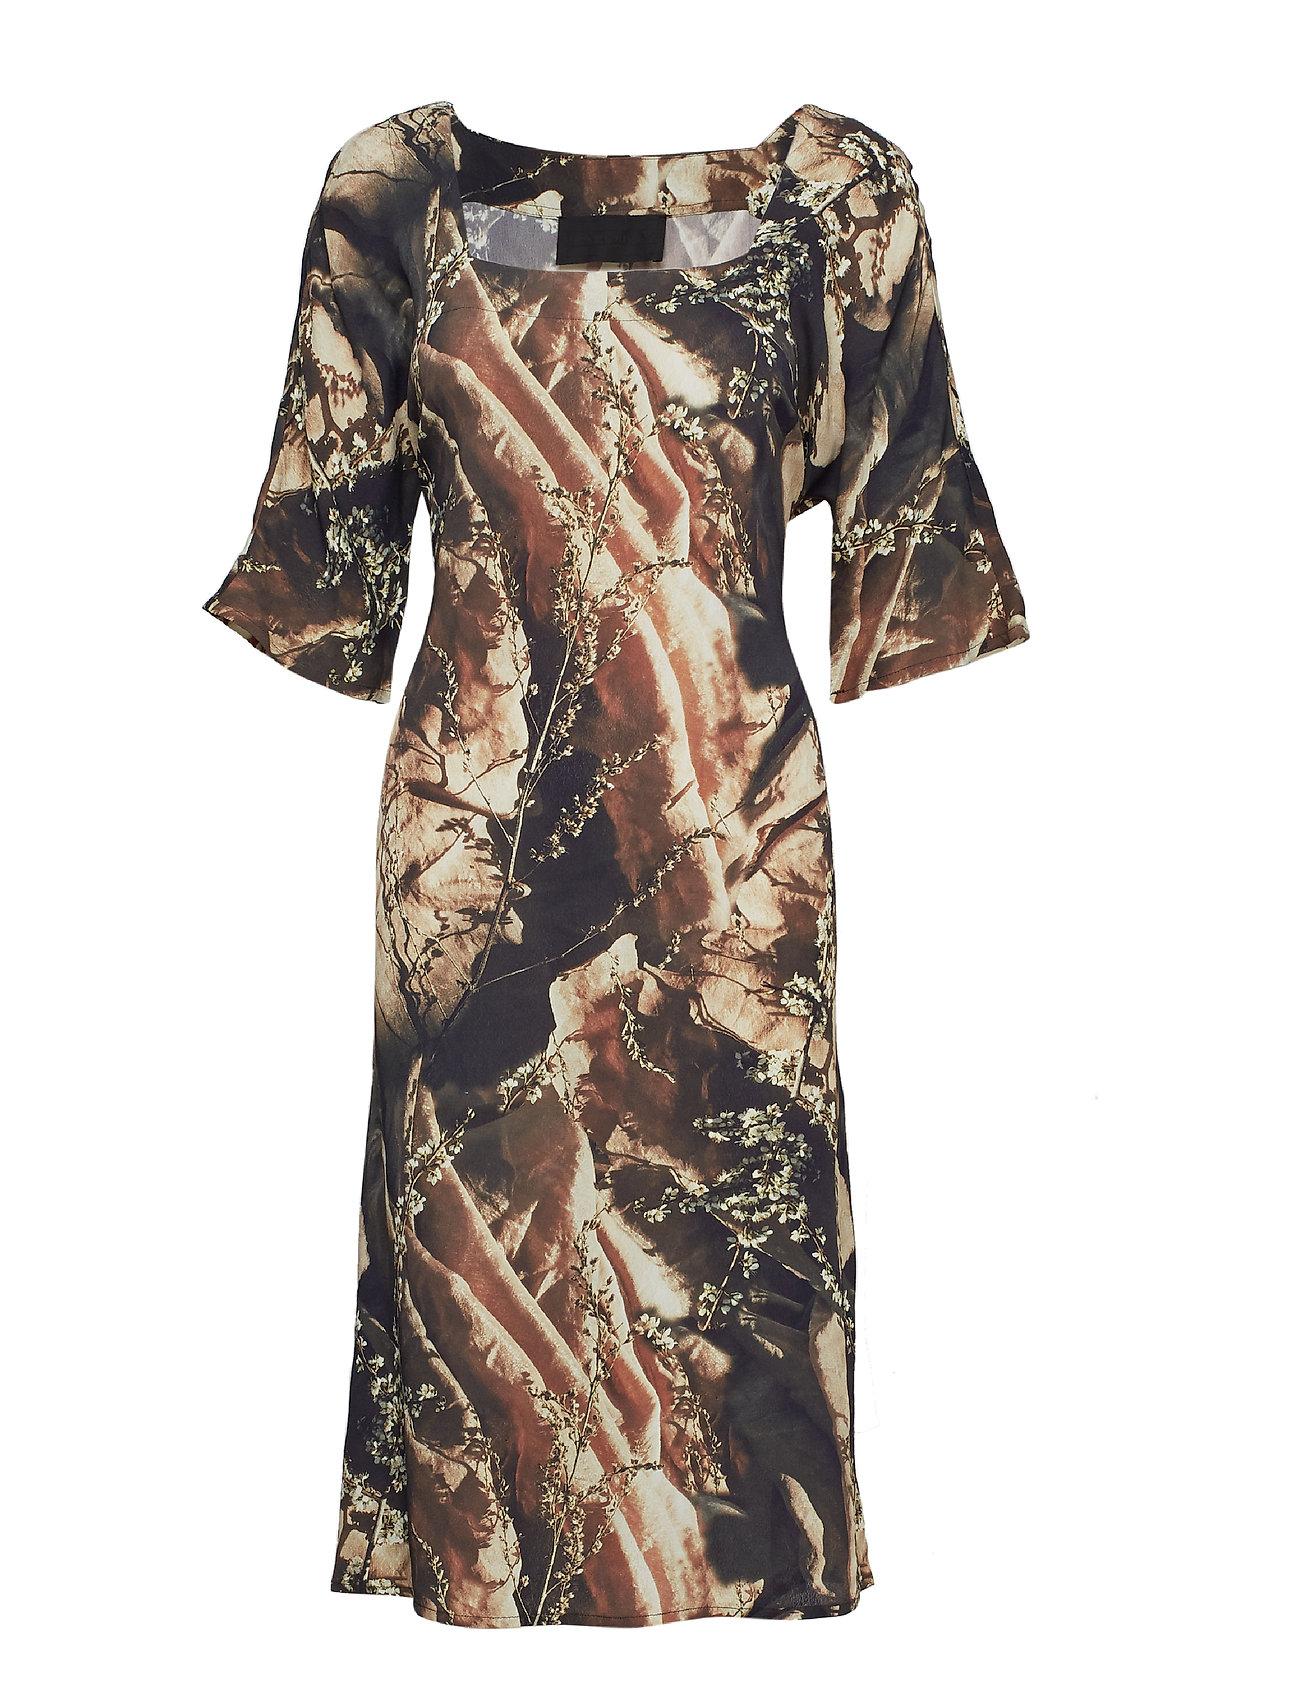 Diana Orving Square Neck Dress - FLOWERS